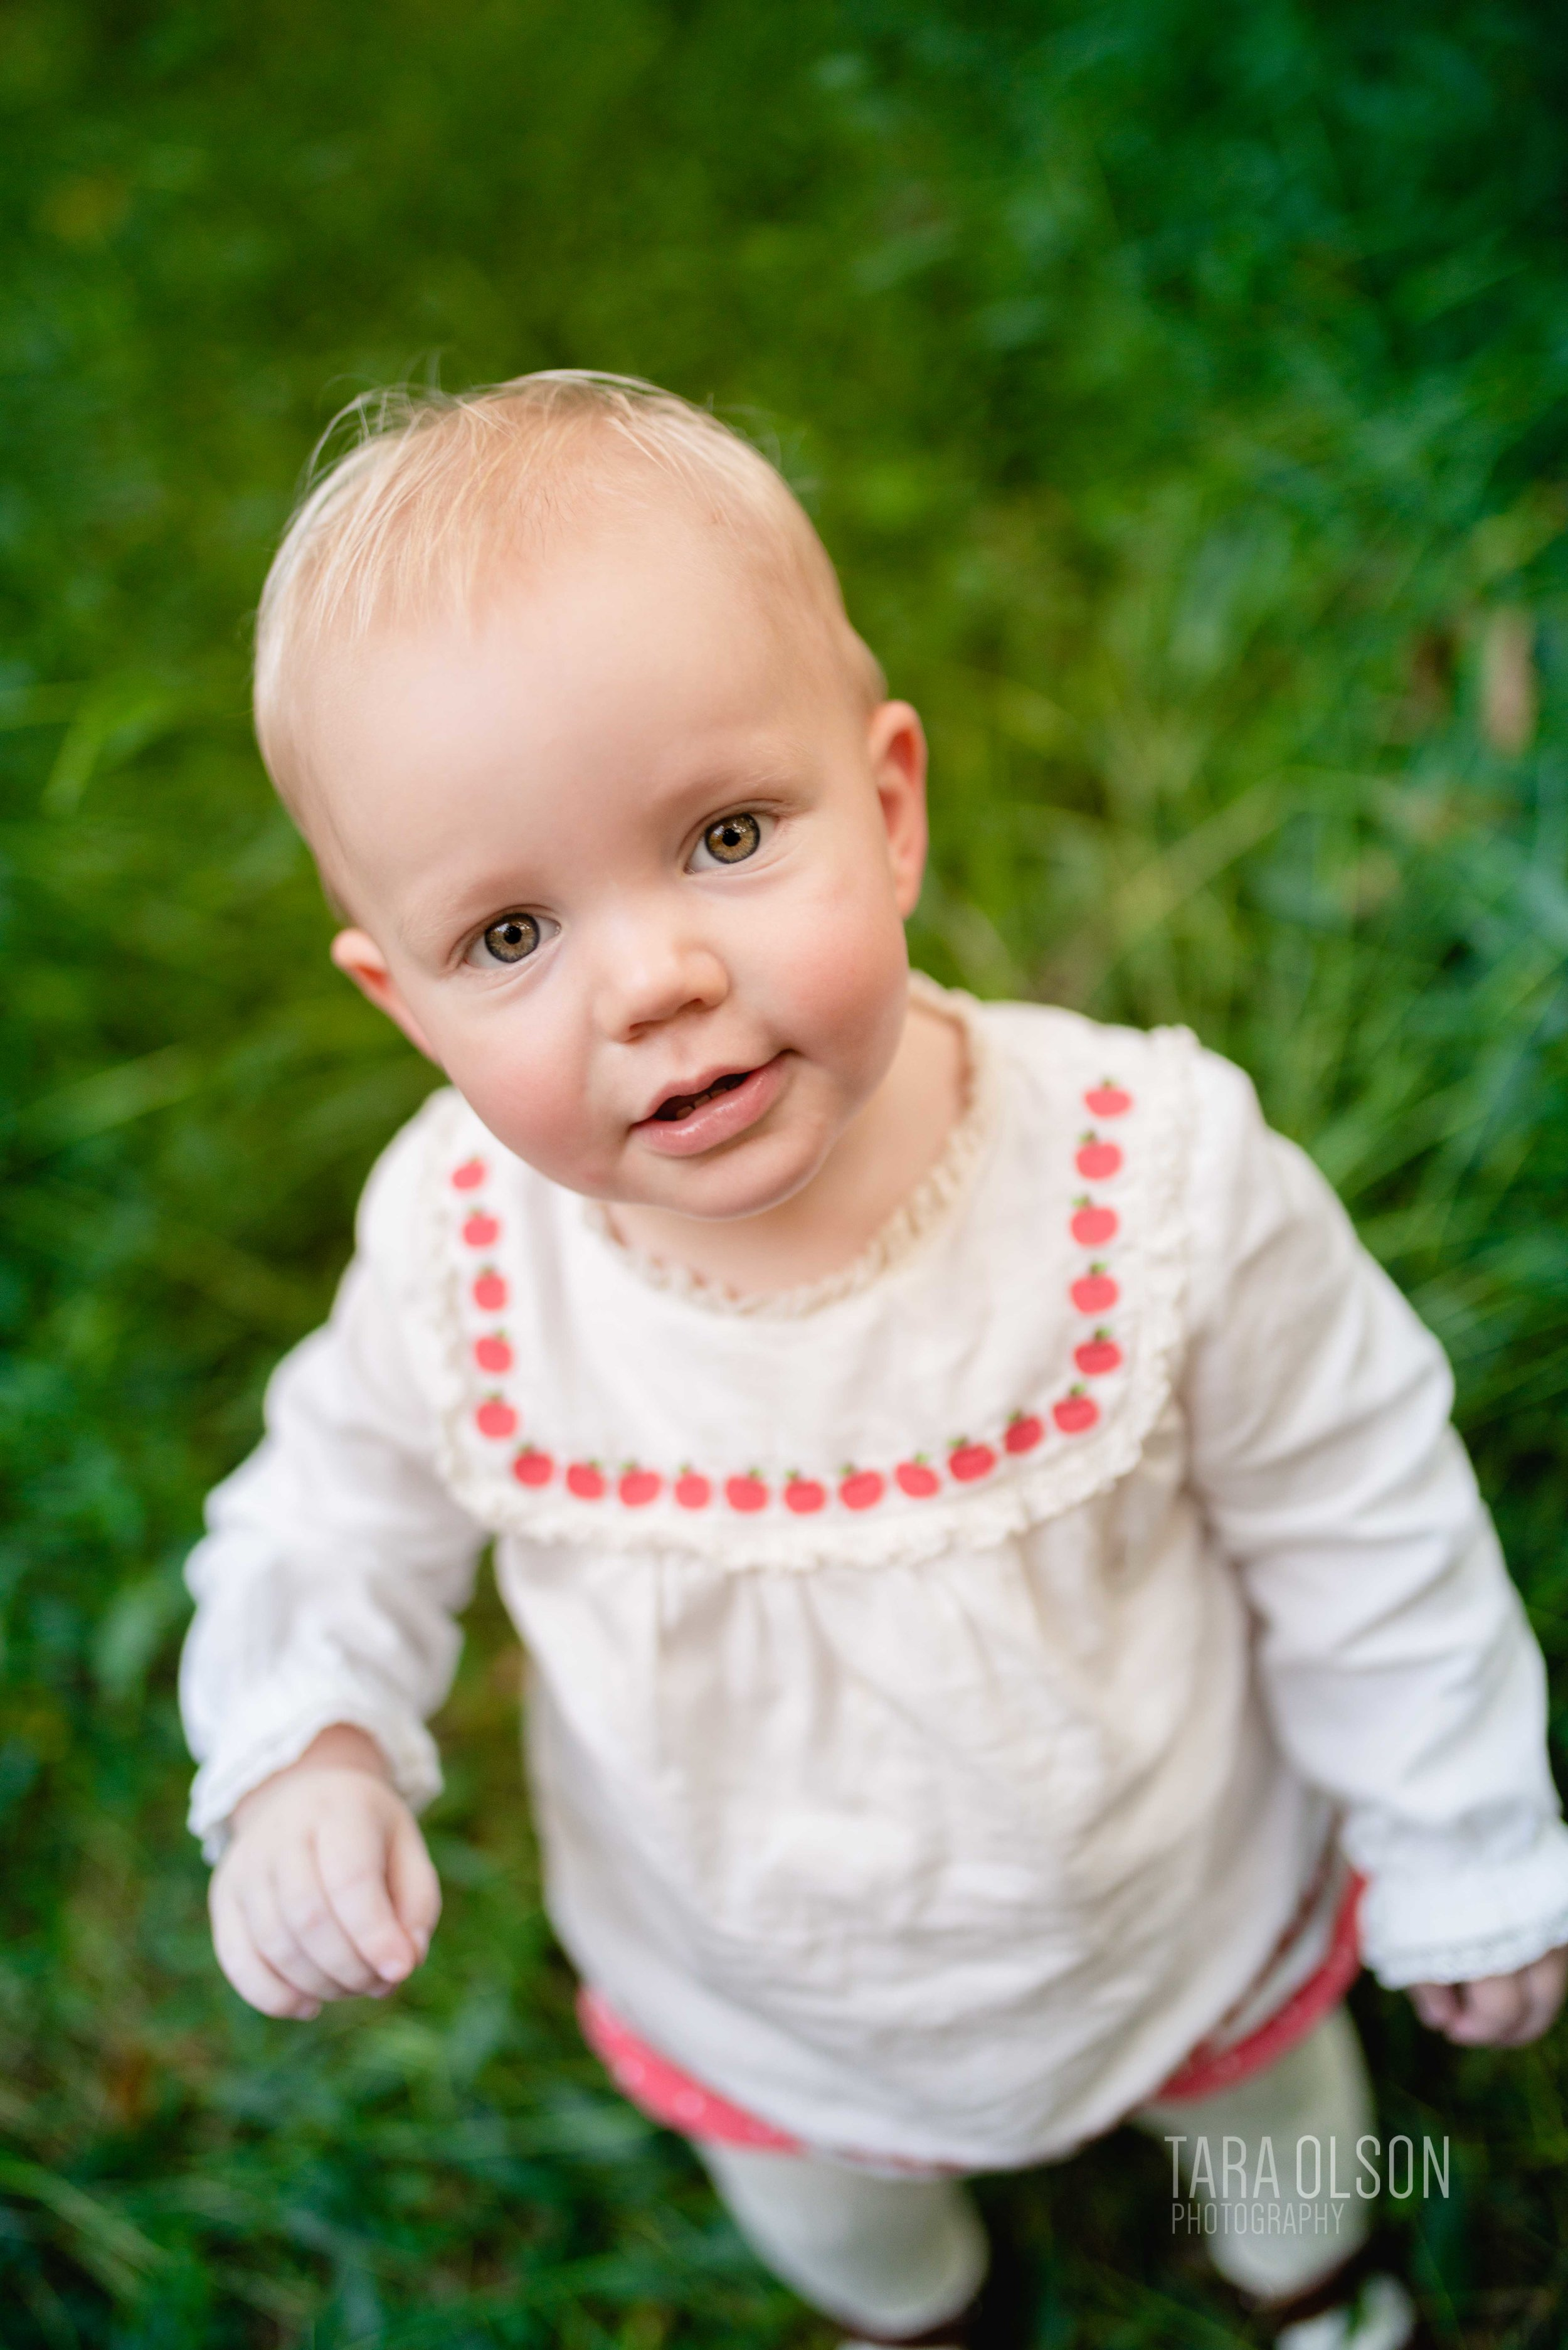 Hawkins_Arlington-Virginia-Family-Photographer_Tara-Olson-Photography_4267.jpg